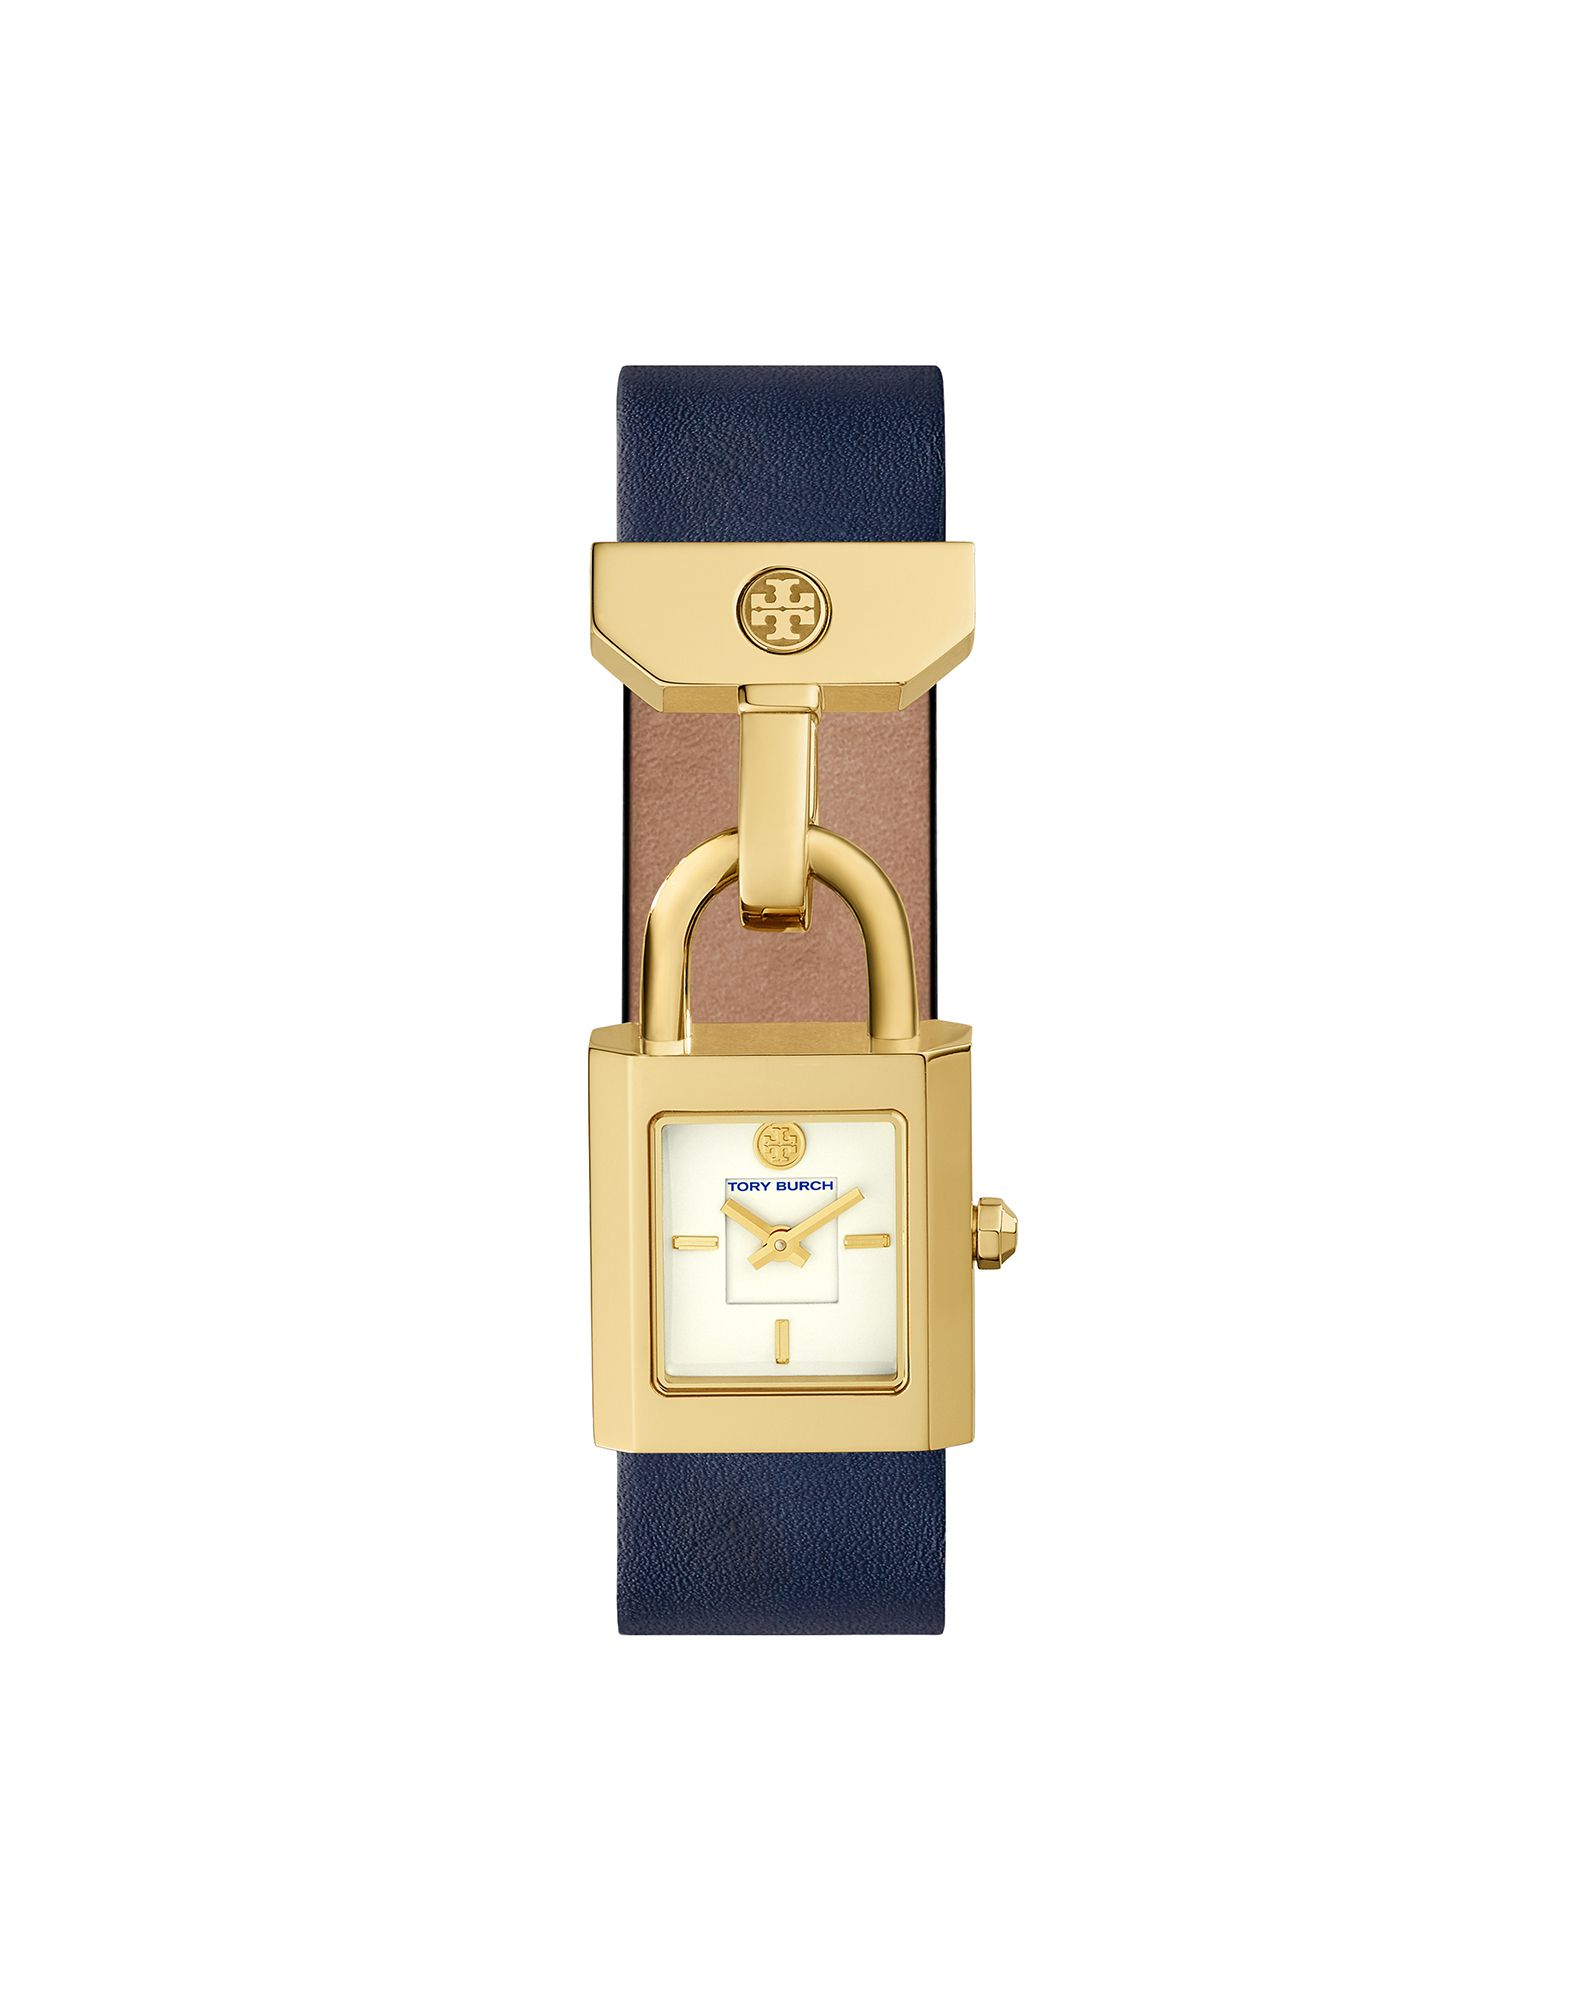 TORY BURCH Damen Armbanduhr Farbe Weiß Größe 1 - broschei